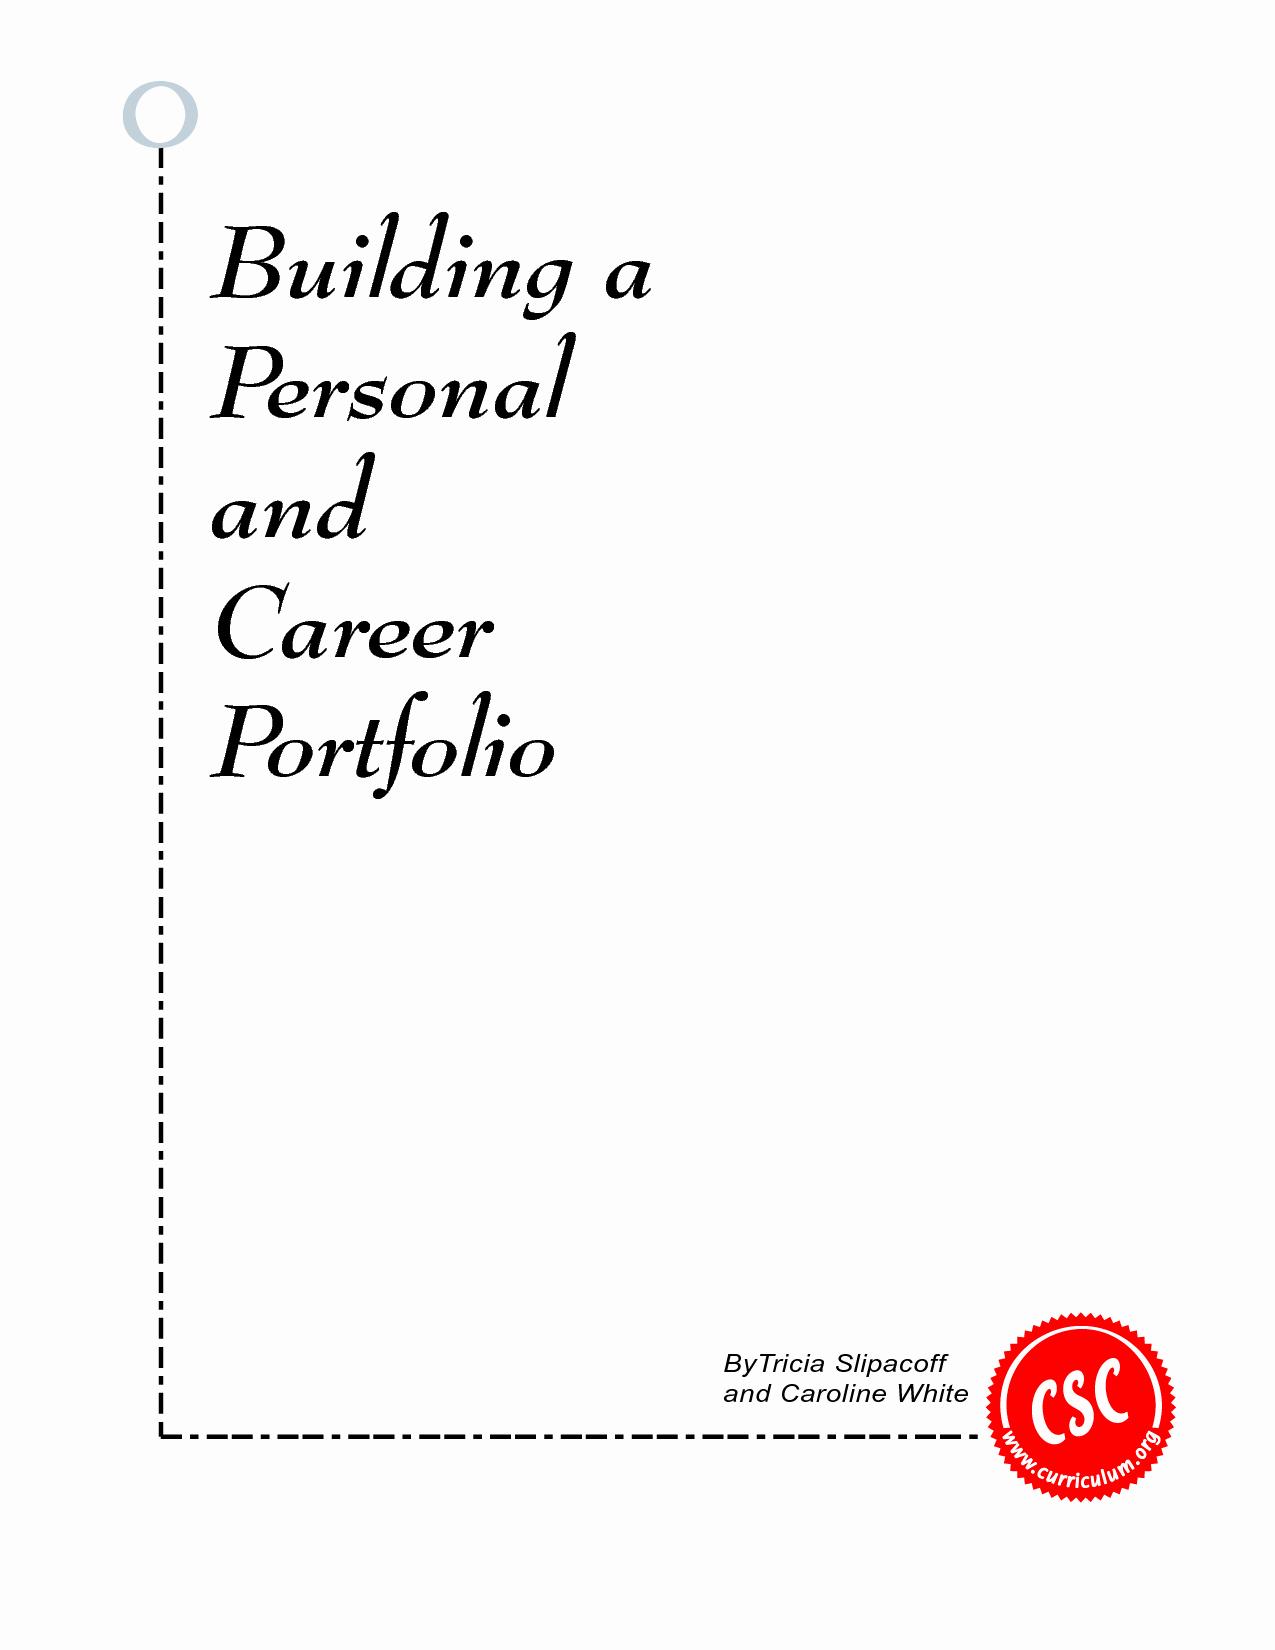 Portfolio Cover Page Templates Elegant 10 Professional Portfolio Cover Page Template